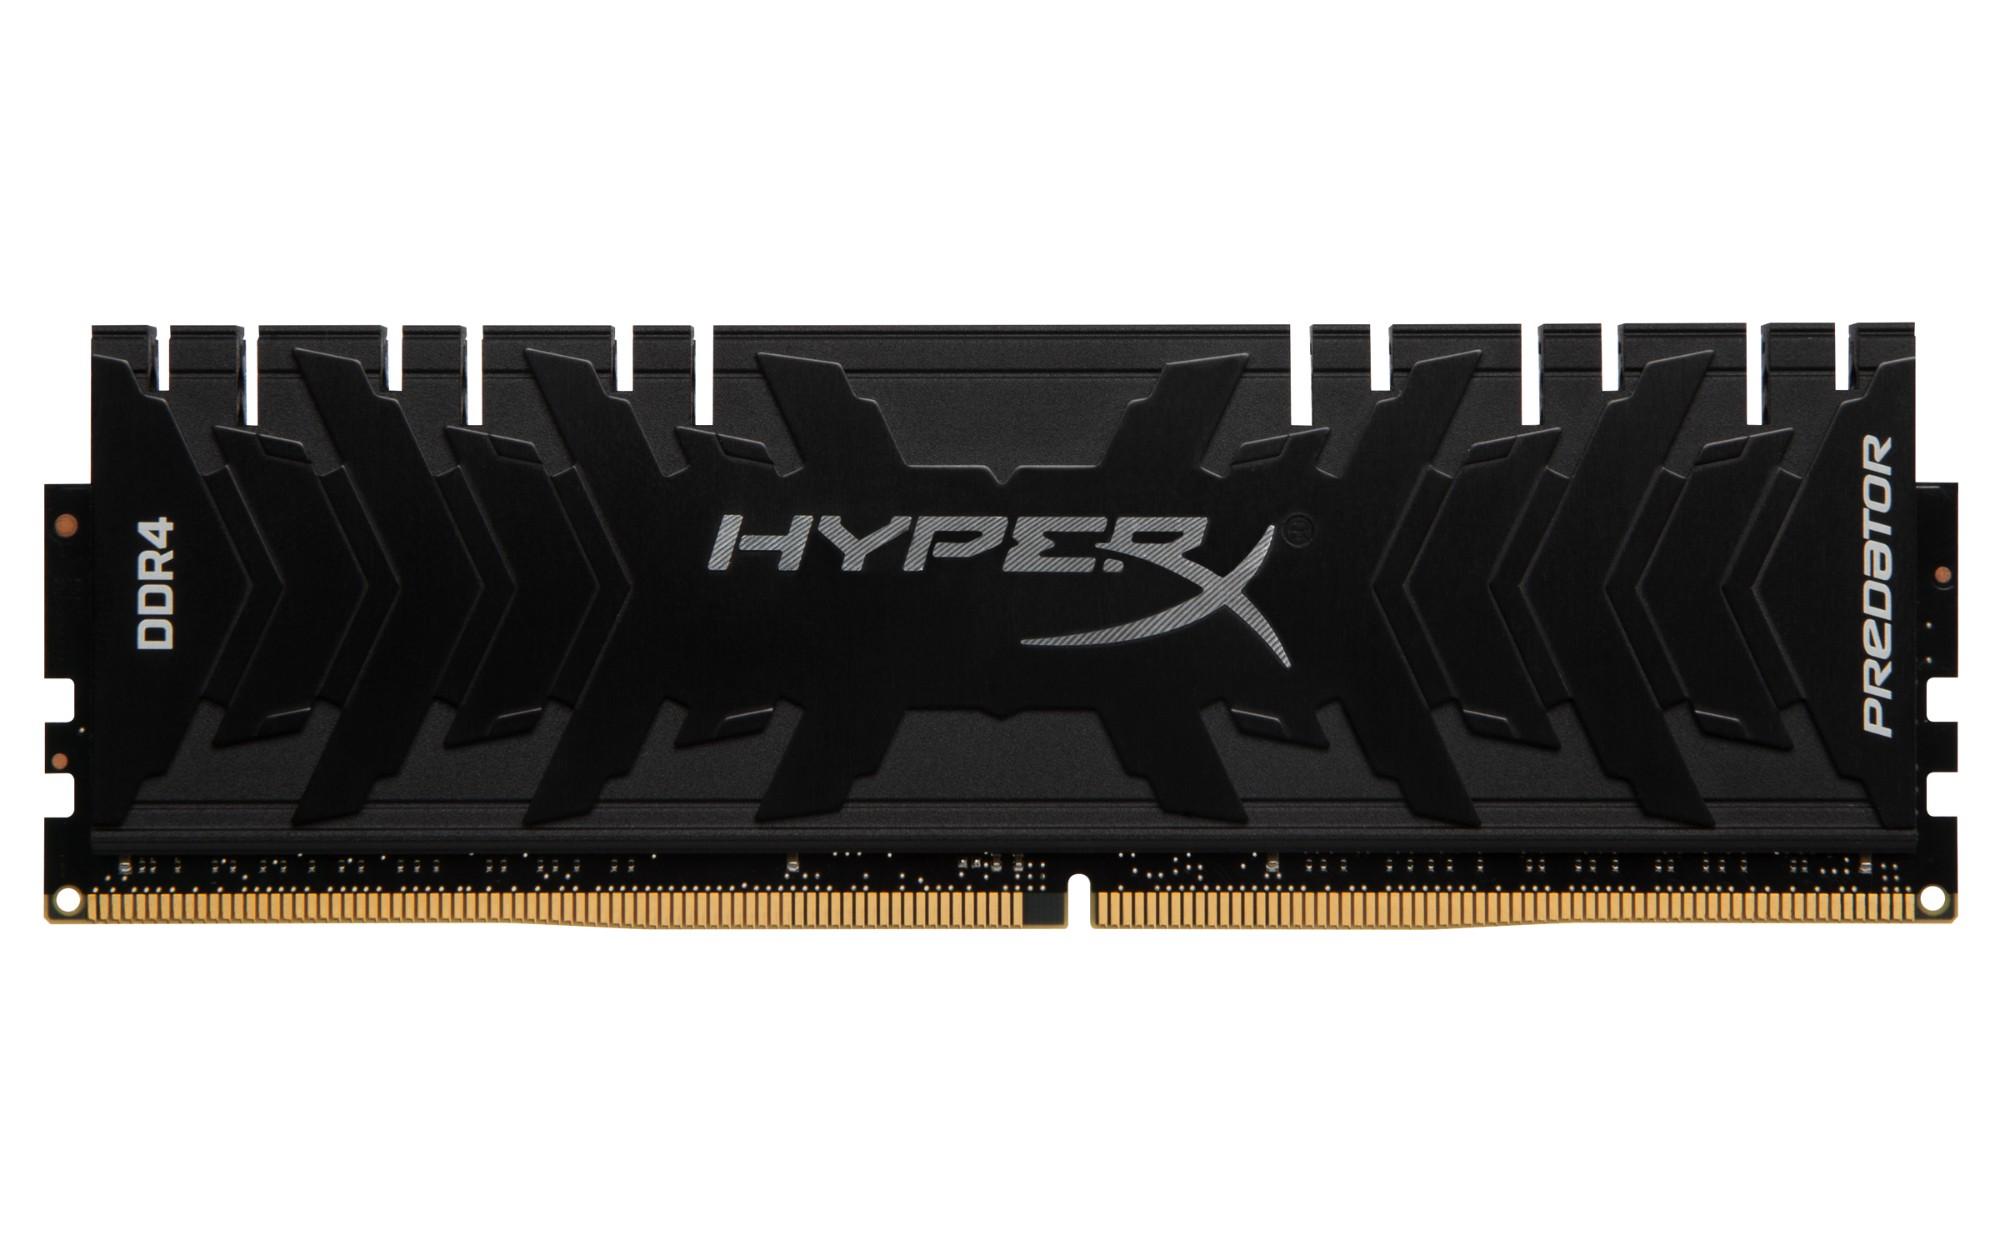 HyperX Predator HX426C13PB3K2/32 módulo de memoria 32 GB 2 x 16 GB DDR4 2666 MHz